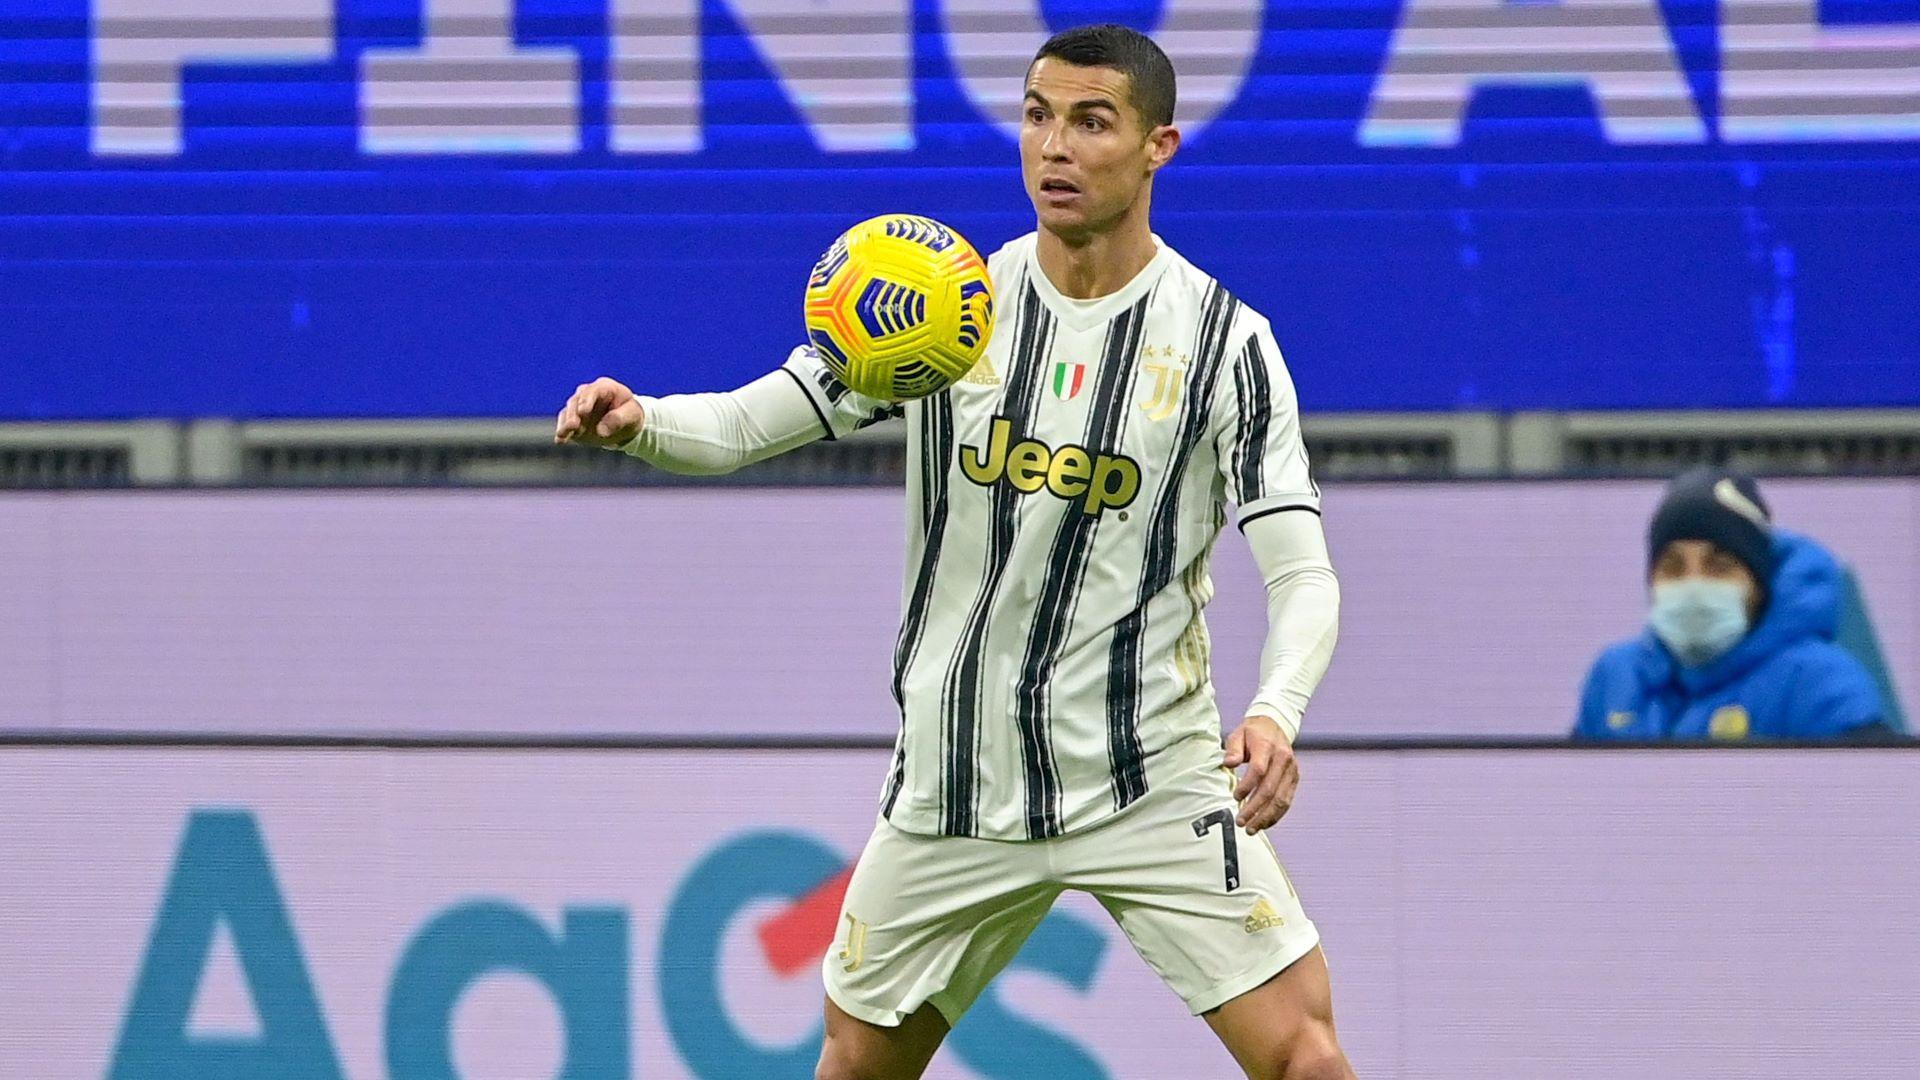 Supercoppa Italiana Juventus Turin Vs SSC Neapel Live Im